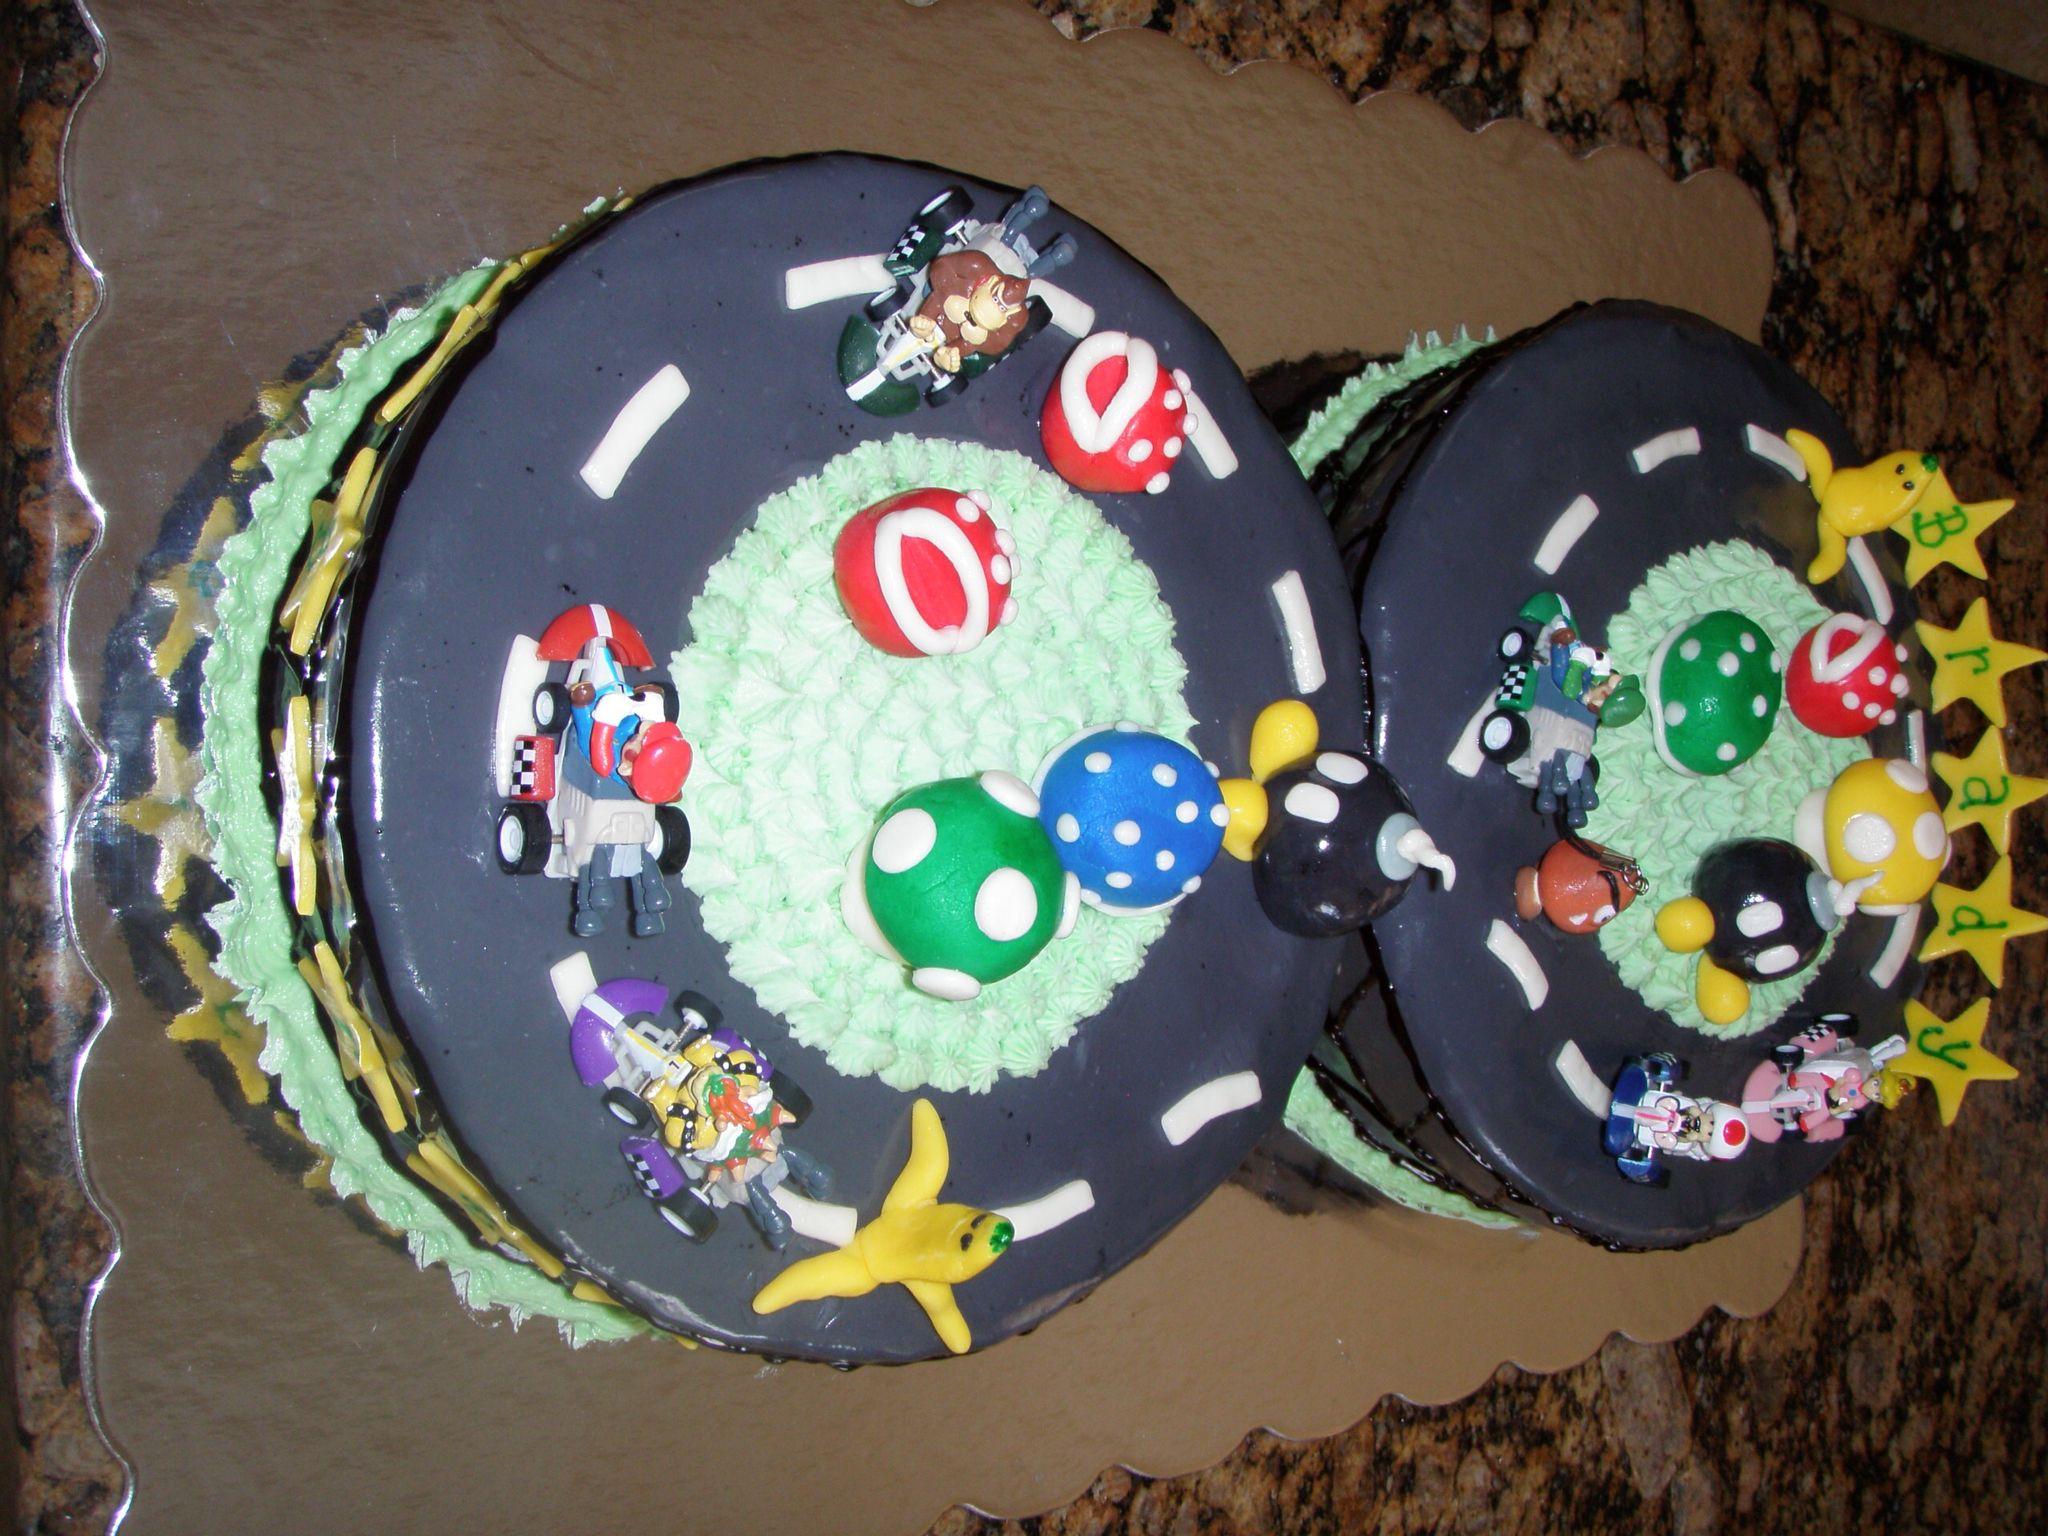 Mario Cart Racetrack Cake